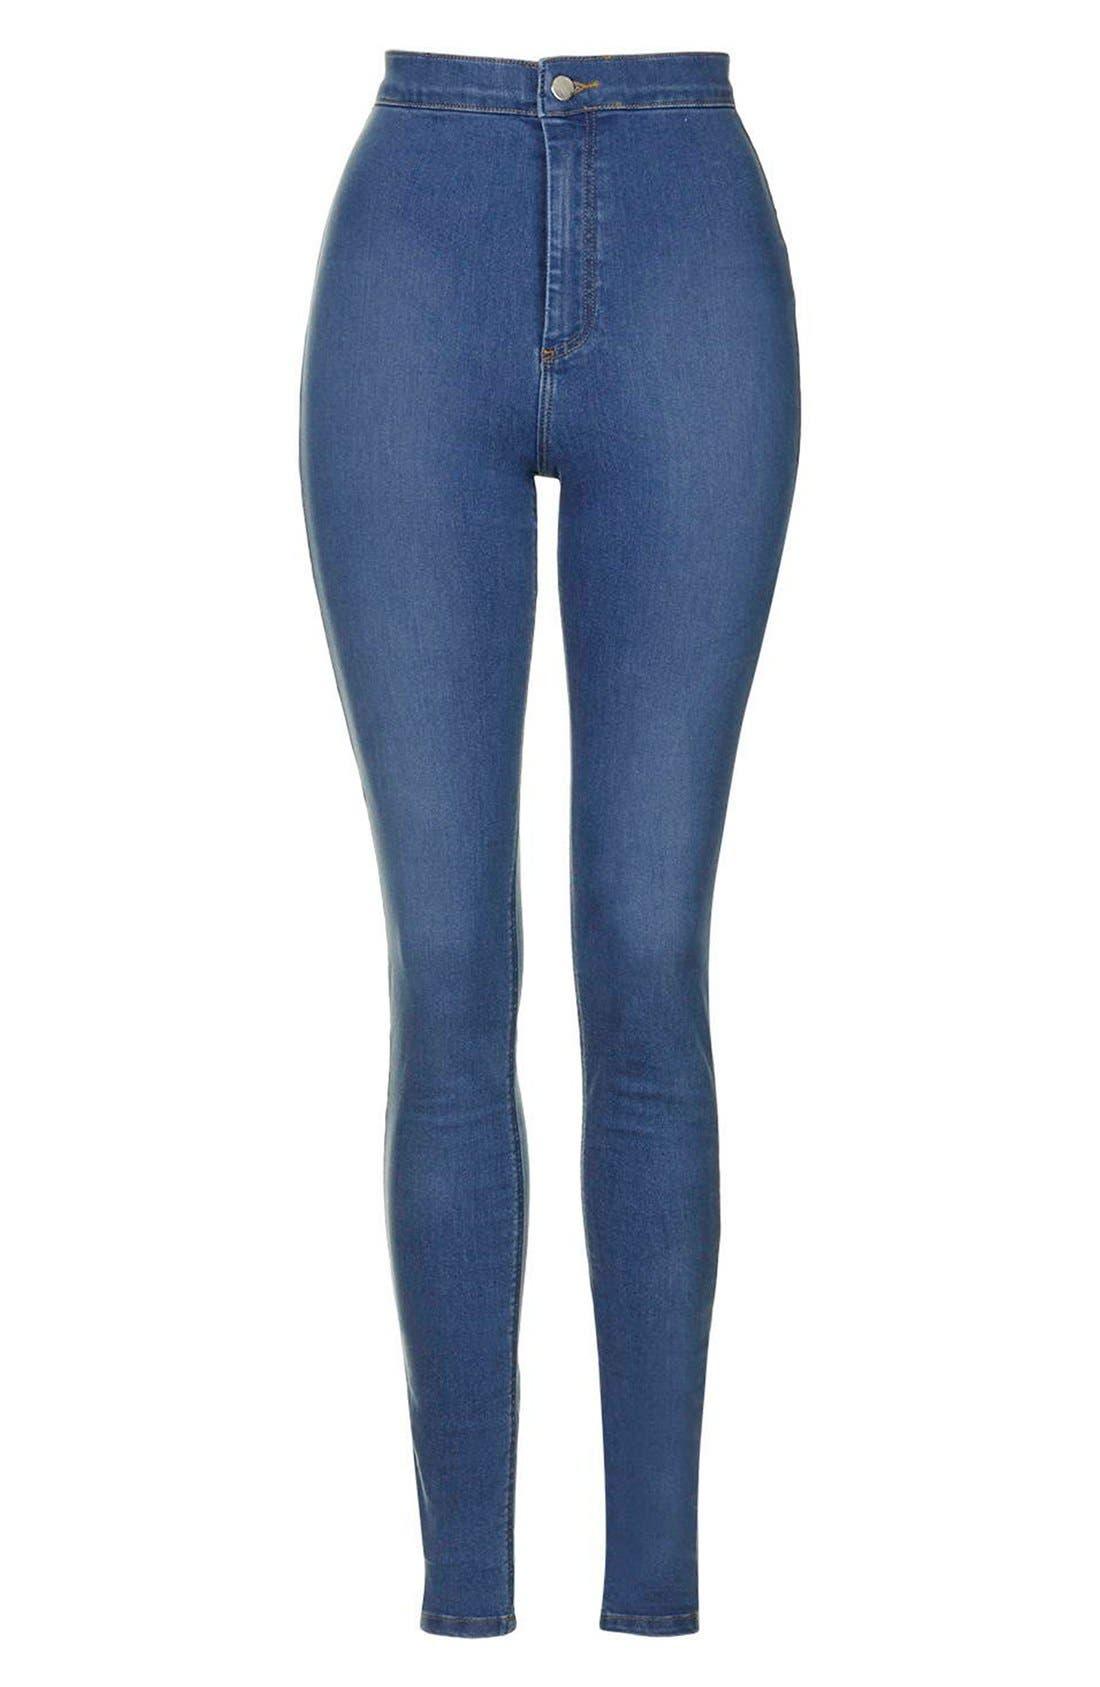 'Joni' High Waist Skinny Jeans,                             Alternate thumbnail 2, color,                             400